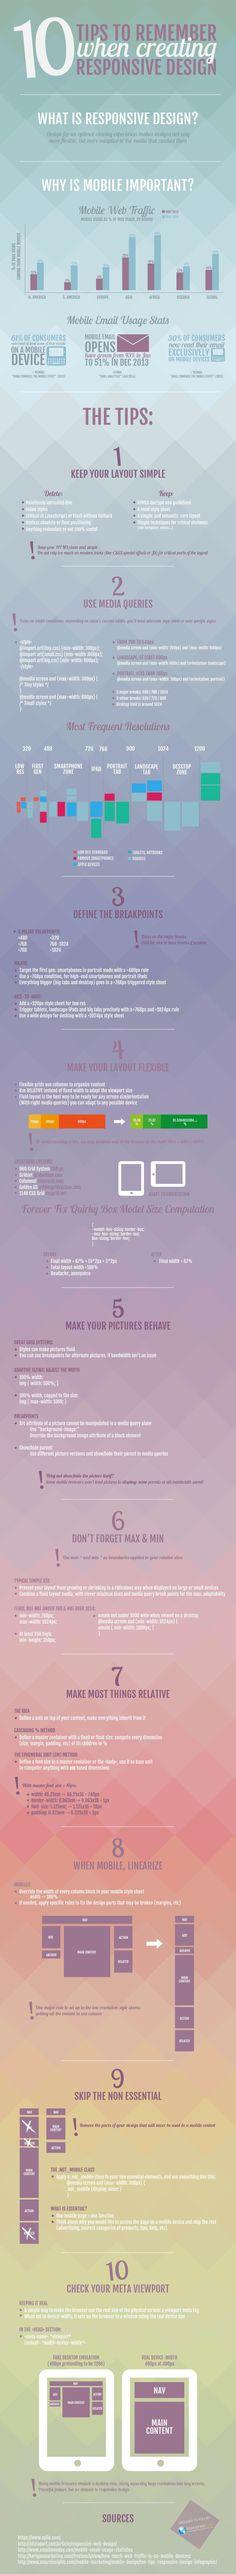 10 #consejos sobre #Responsive #Design #diseño #infografia